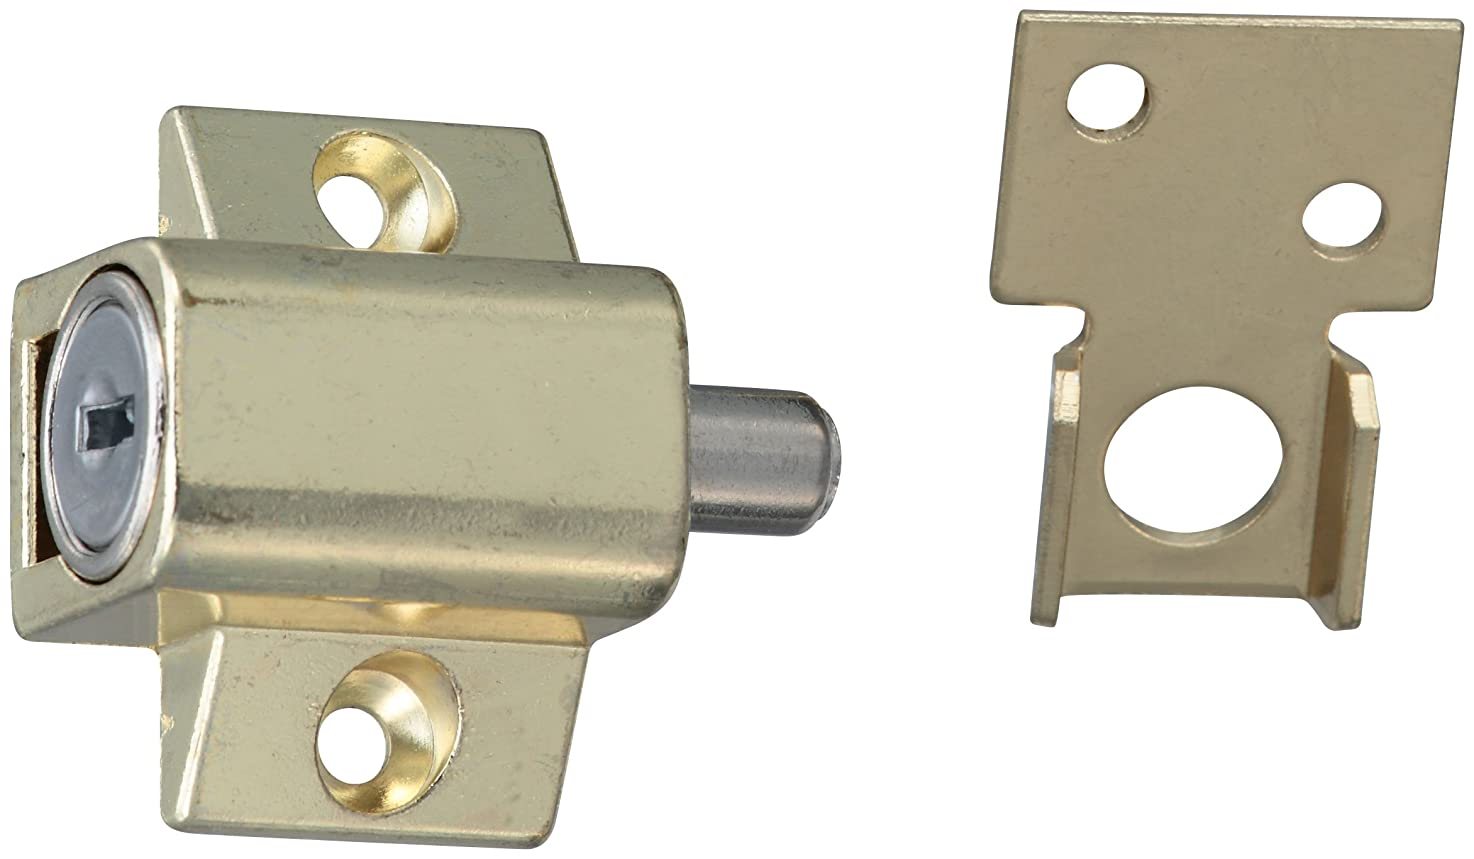 Stanley 610500 - Bright Brass(3) Window Vent Lock Guard